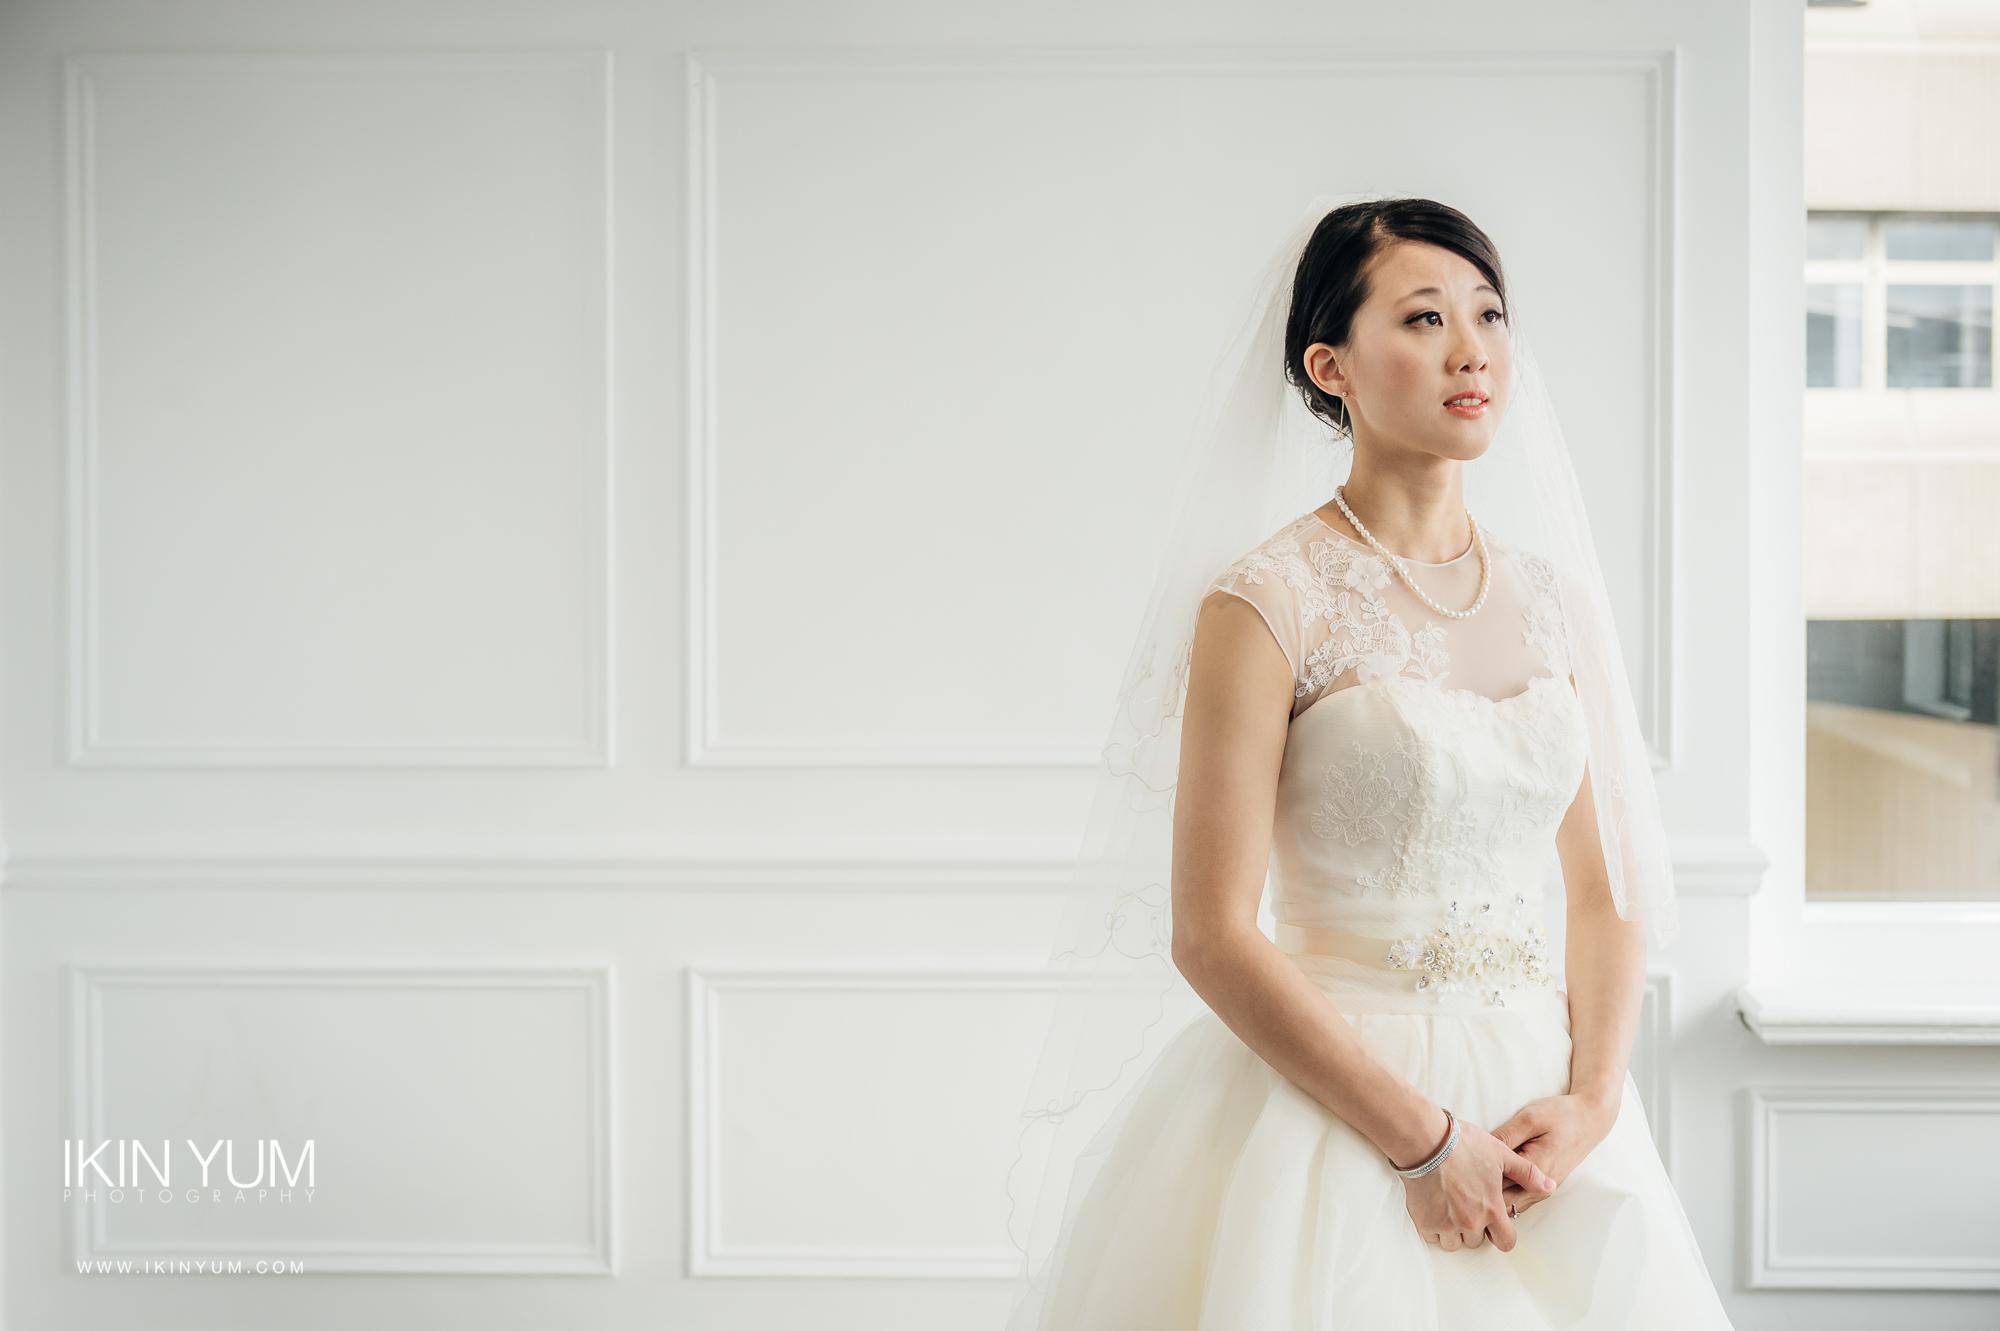 Mermaid river rooms Wedding - Ikin Yum Photography-042.jpg